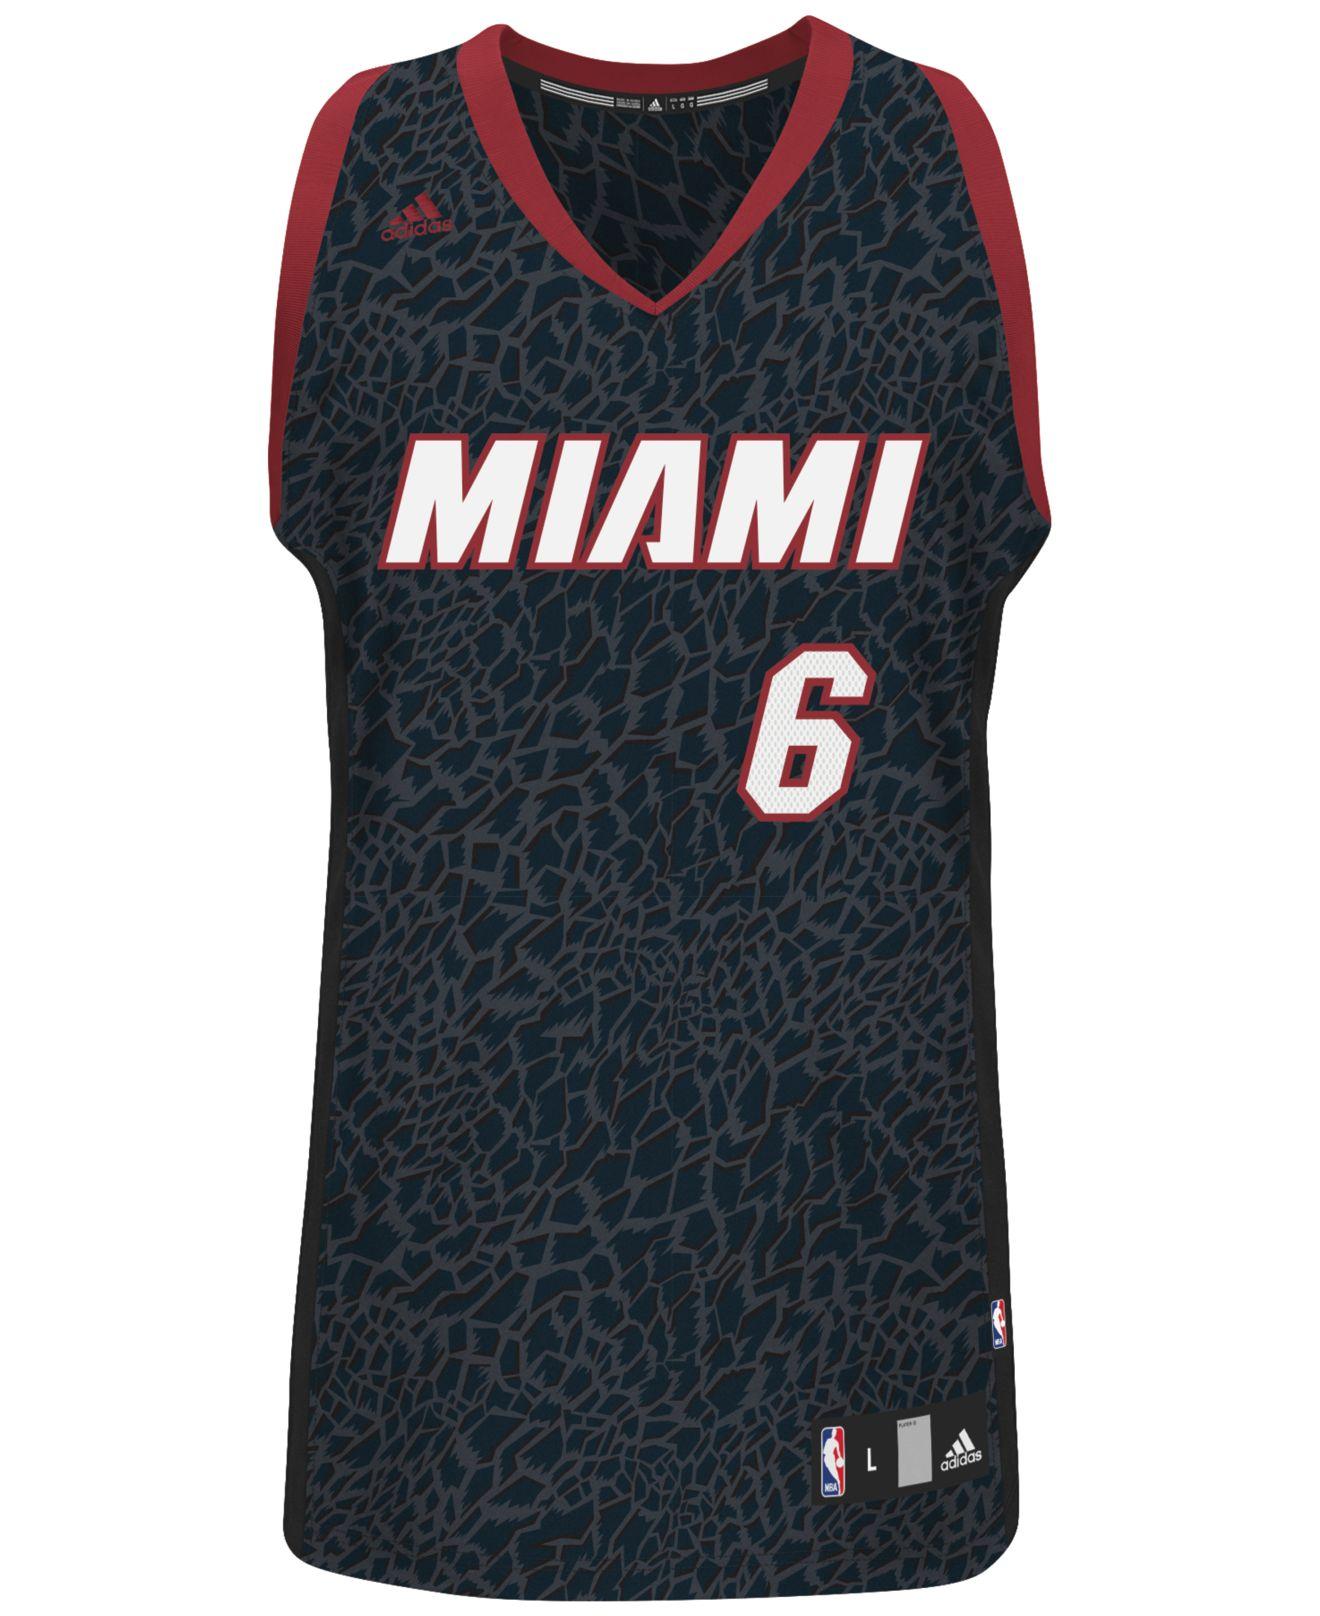 678d9df505c Lyst - adidas Men's Miami Heat Lebron James Crazy Light Jersey in ...